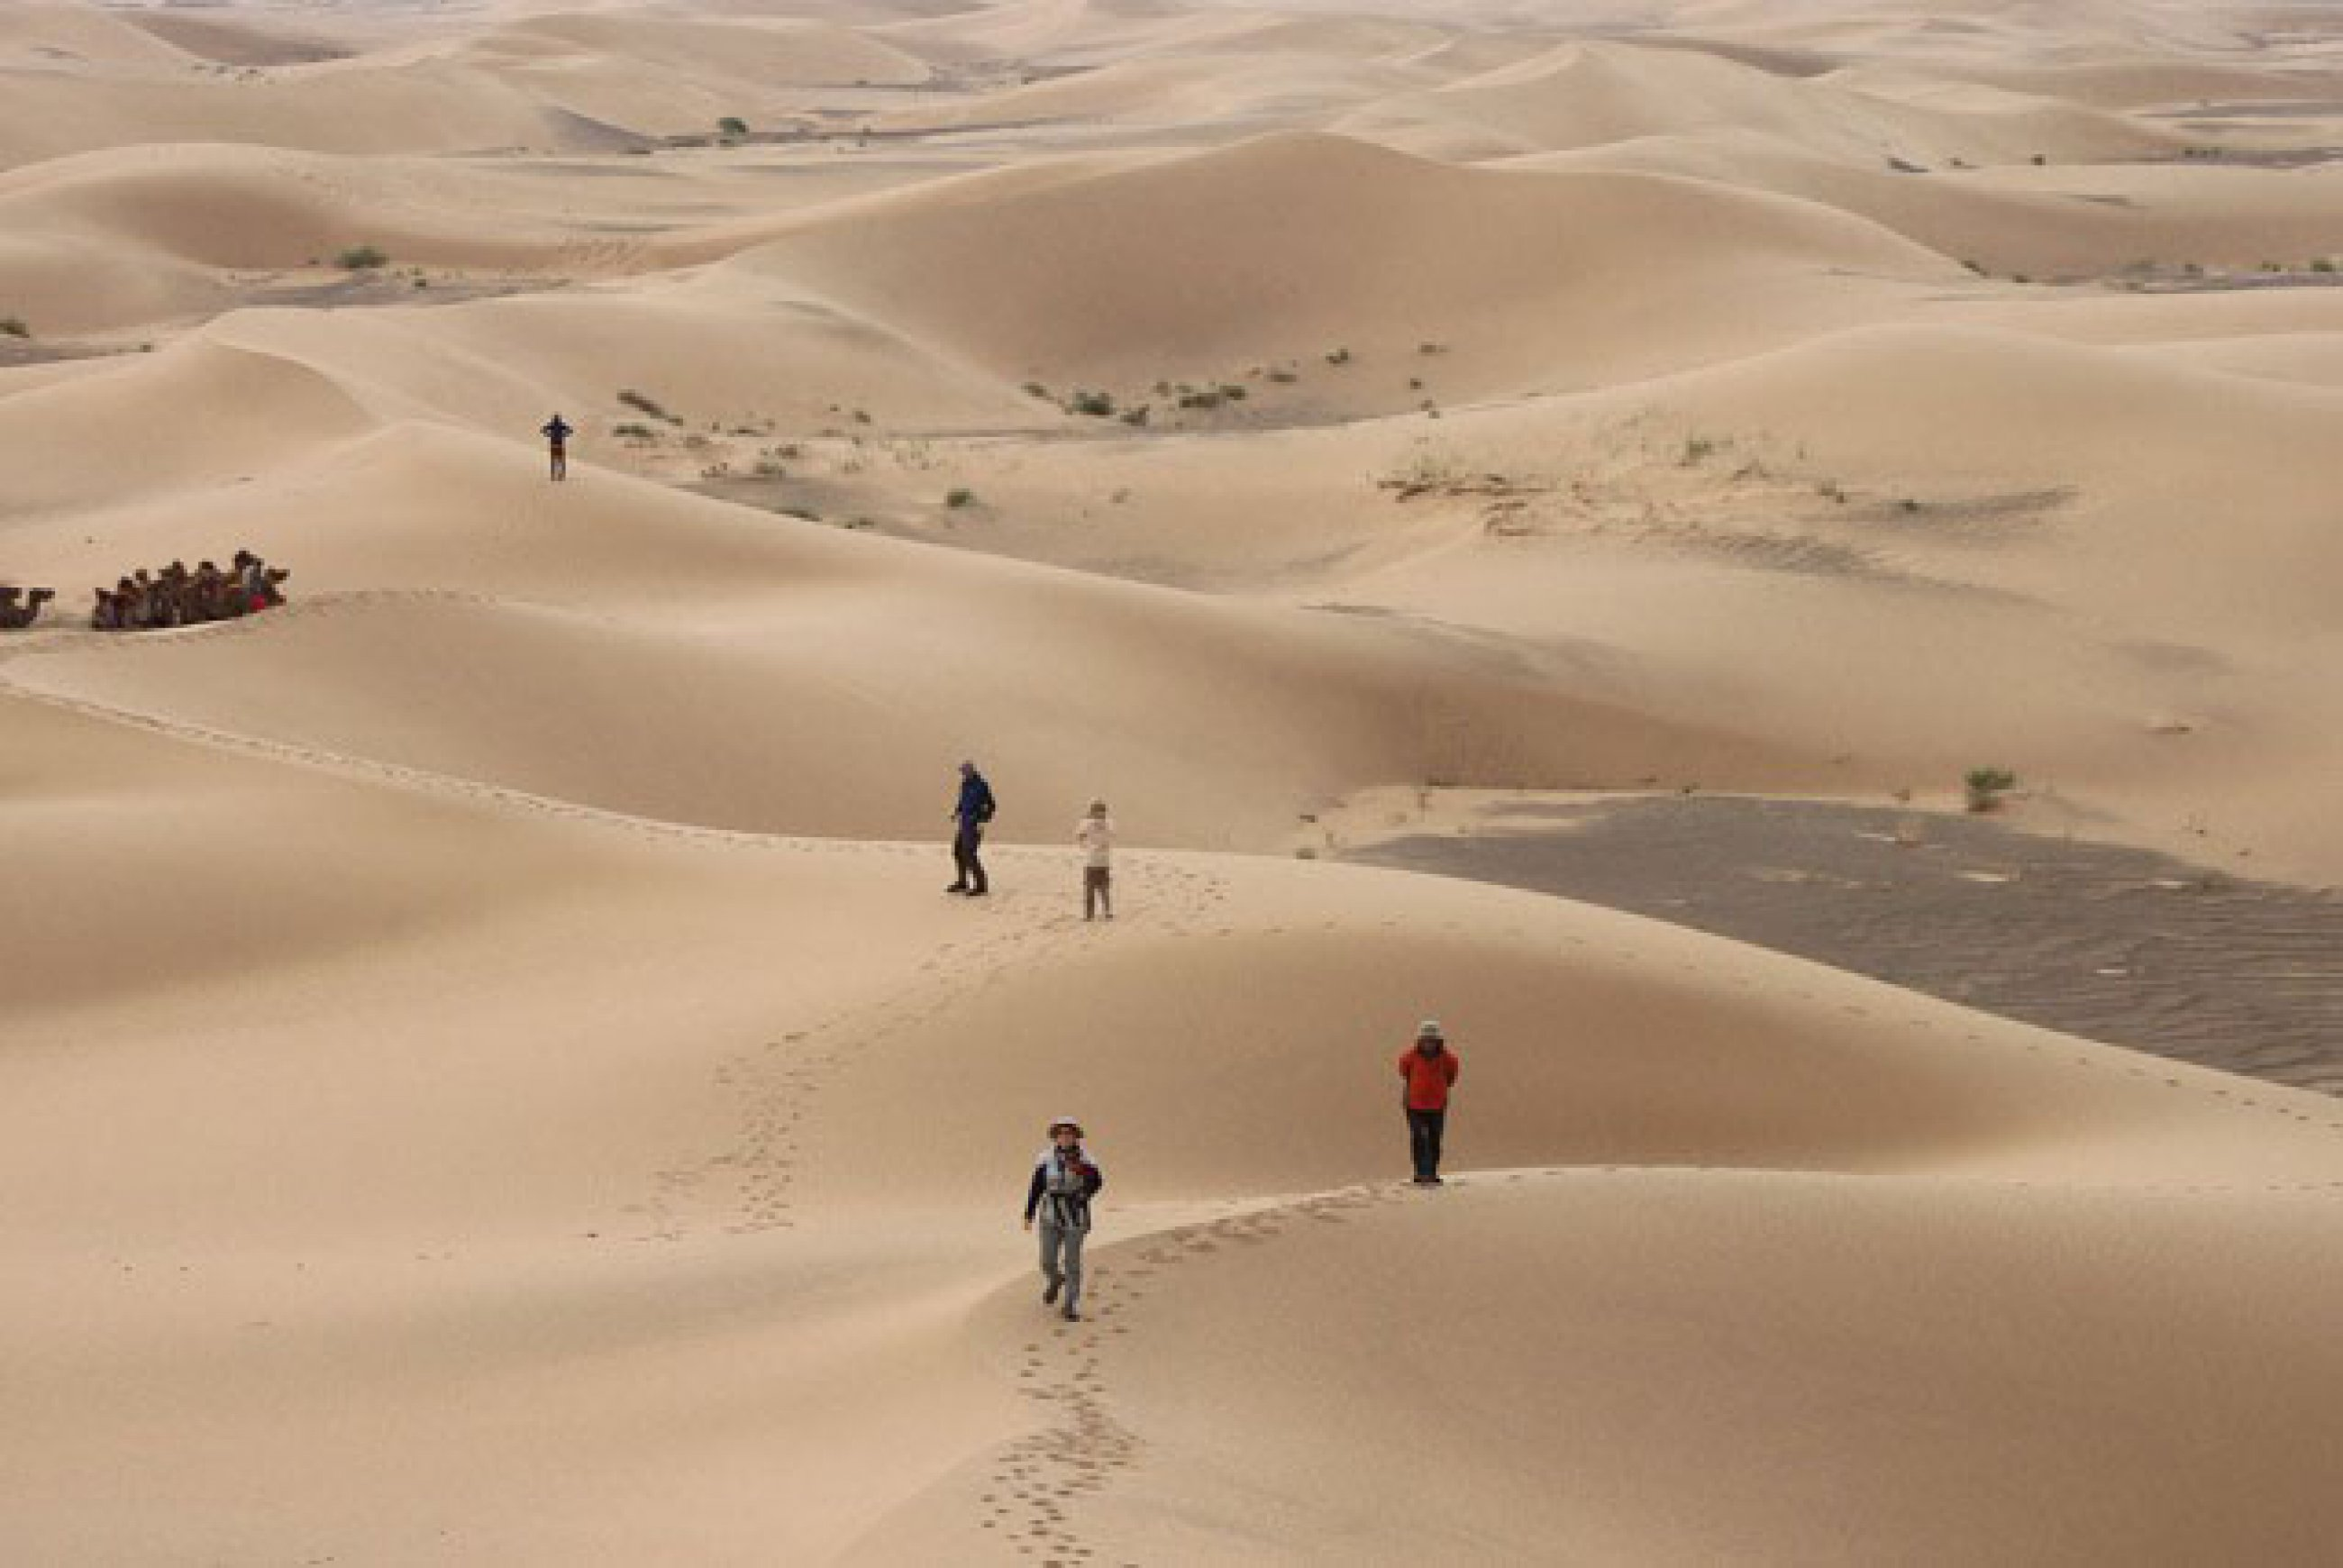 https://bubo.sk/uploads/galleries/7450/sand-dunes-hongoryn-els.jpg